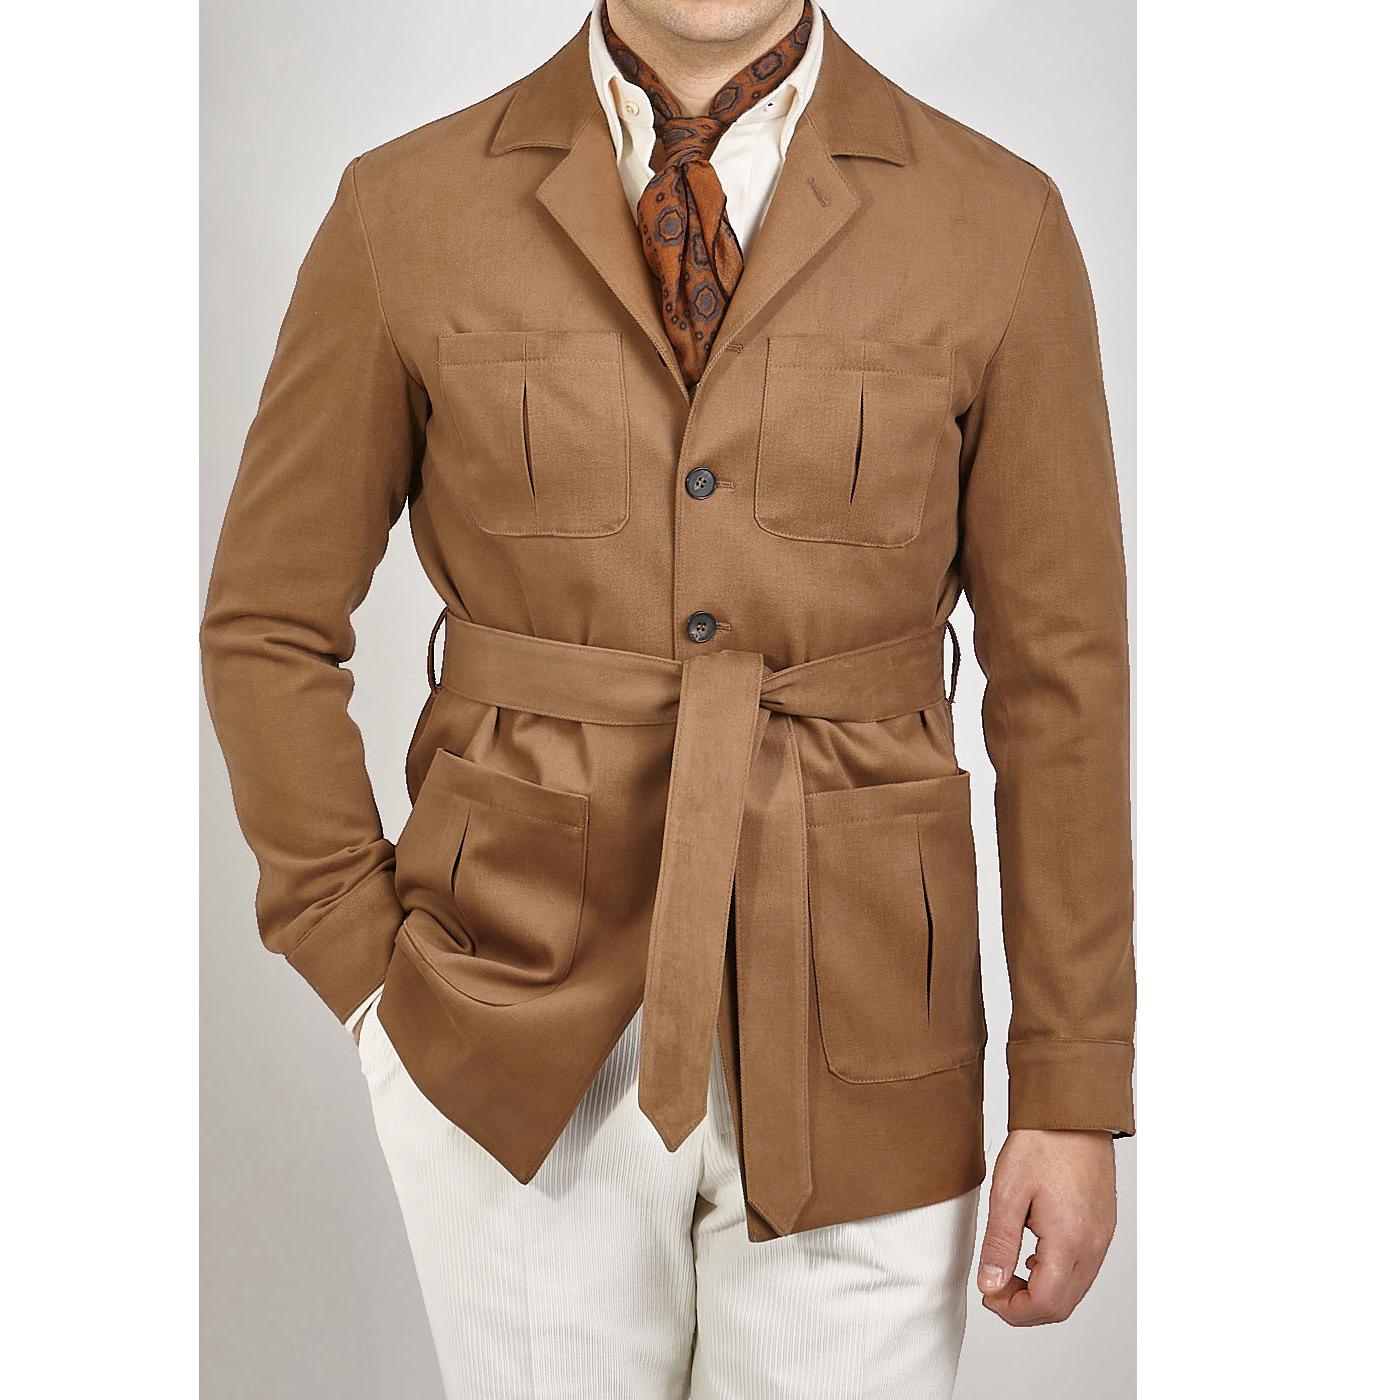 Baltzar Sartorial Warm Beige Cotton Moleskin Safari Jacket Front